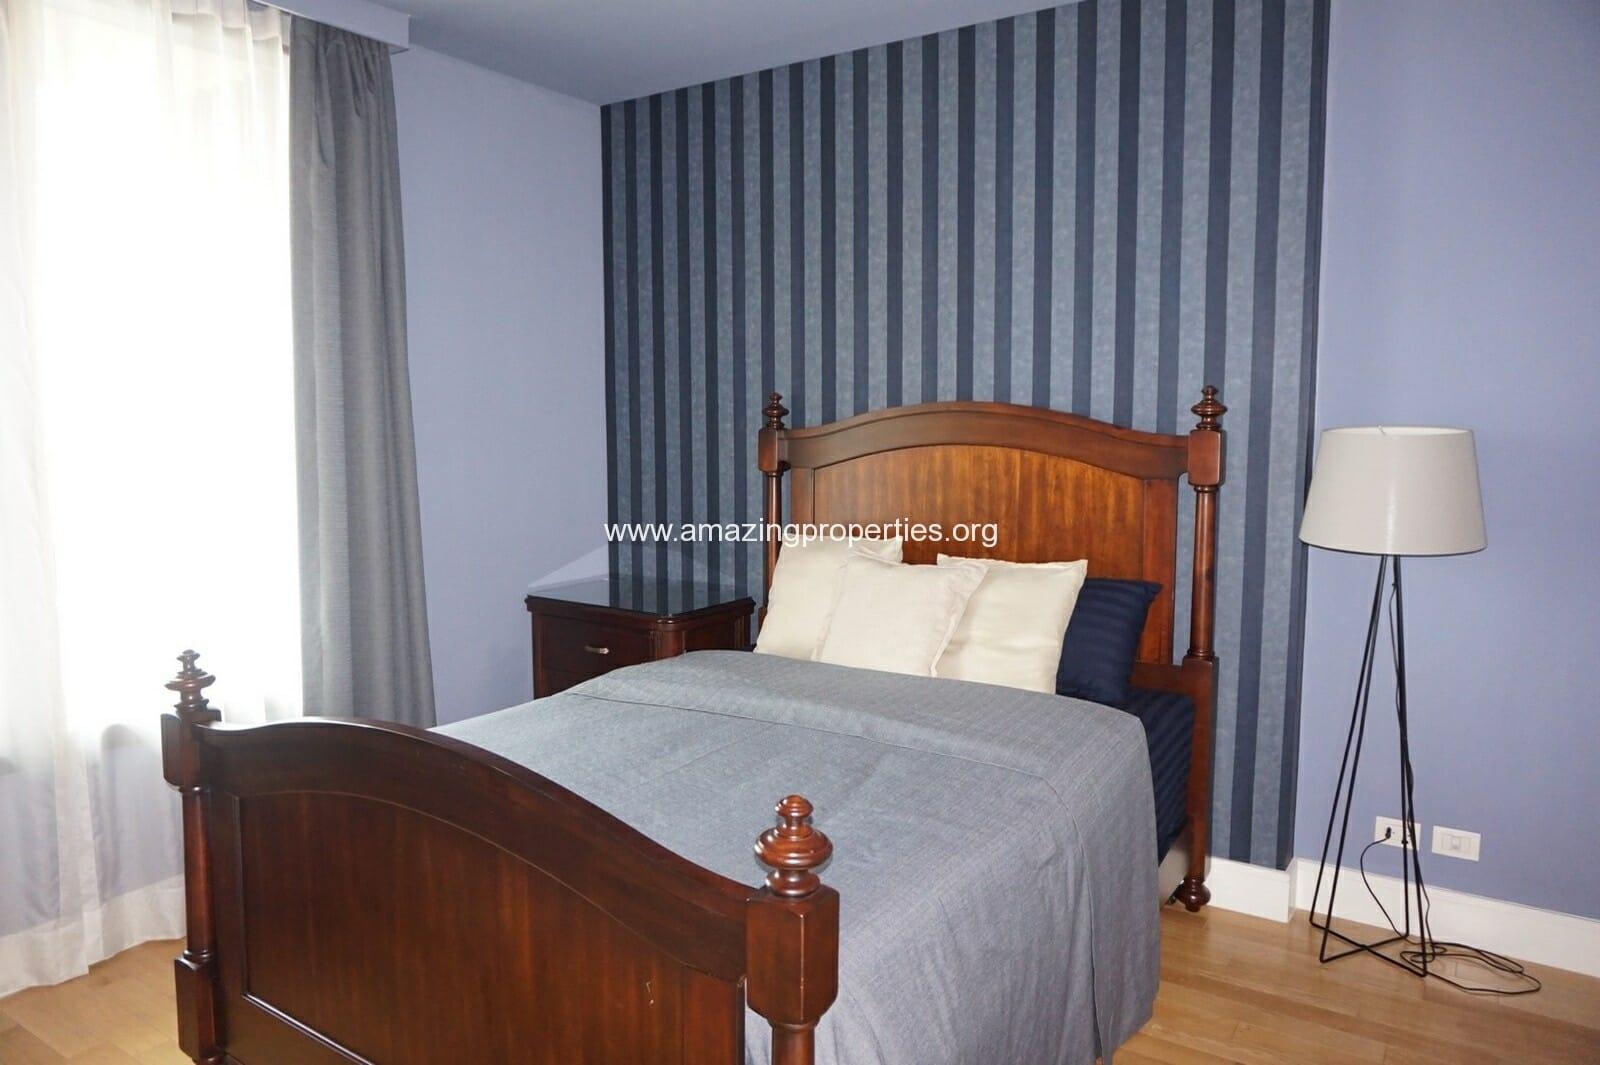 Aguston 3 bedroom-1